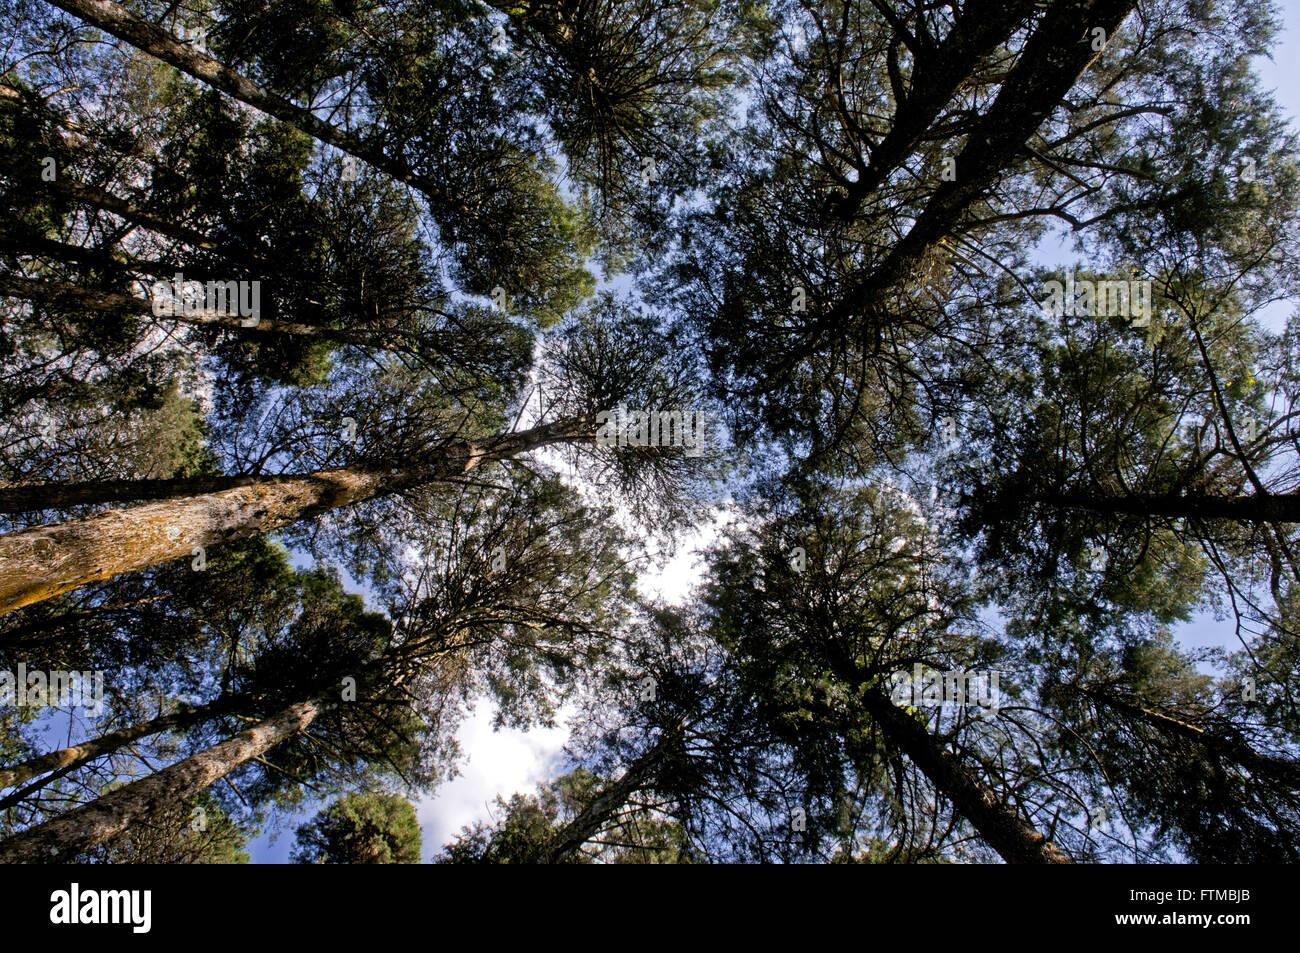 Bosque Irma Clementina im Bairro Alto Curitiba Stockbild